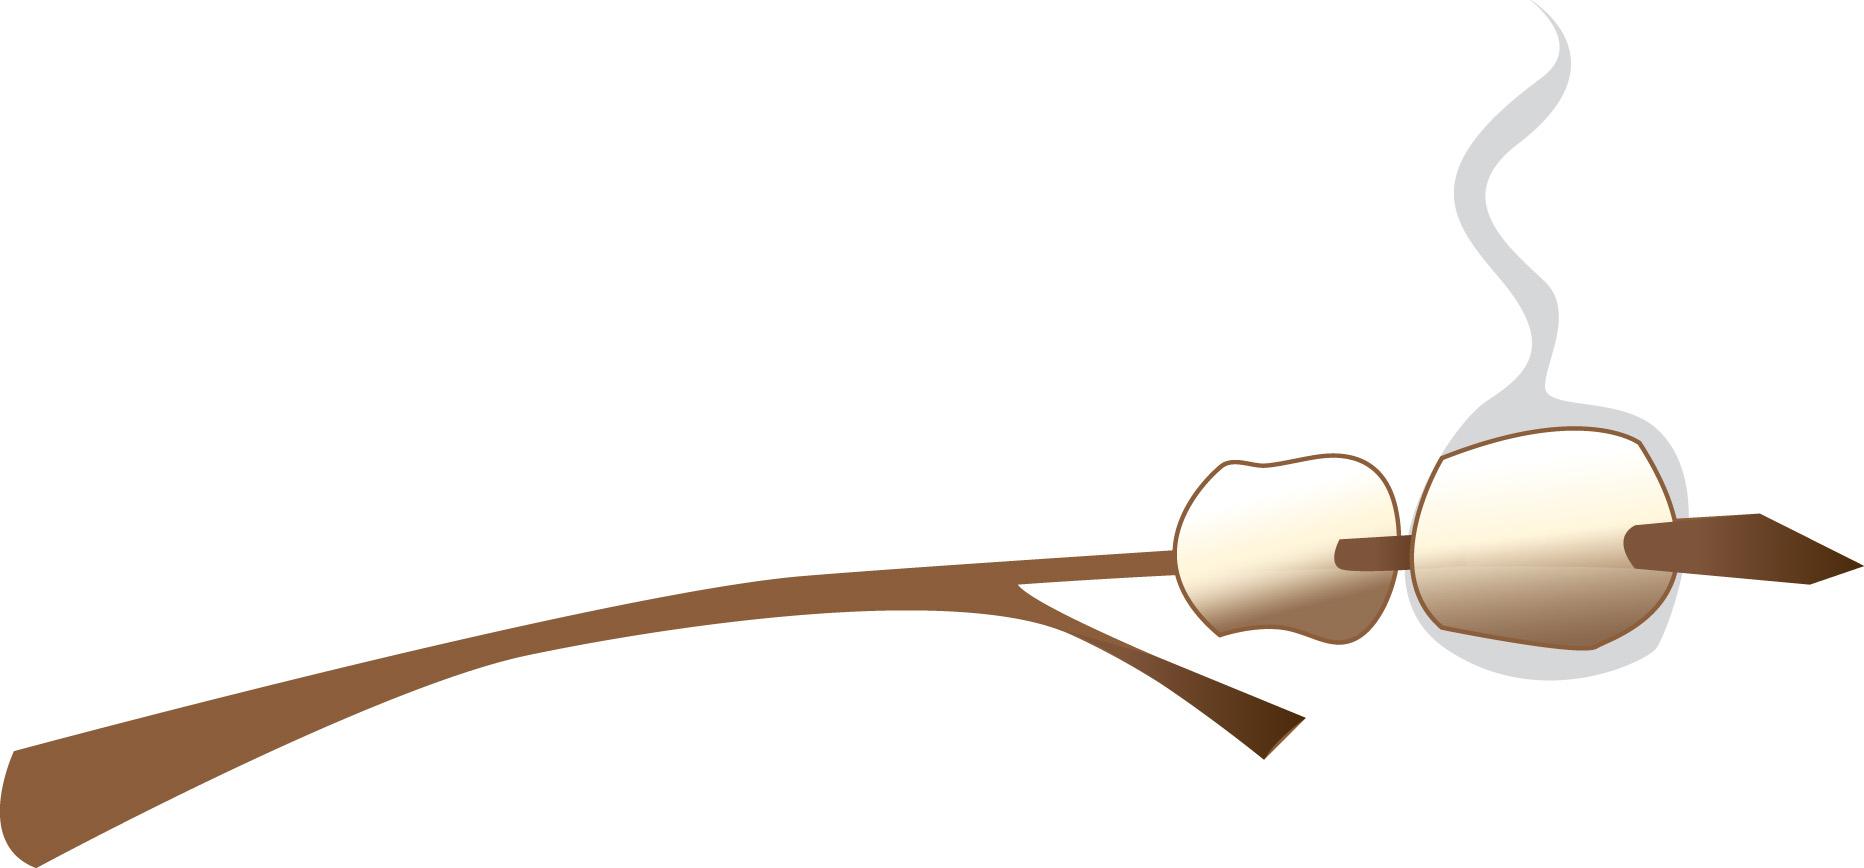 Marshmellow clipart Cartoon Clip Clipart Marshmallow Marshmallow